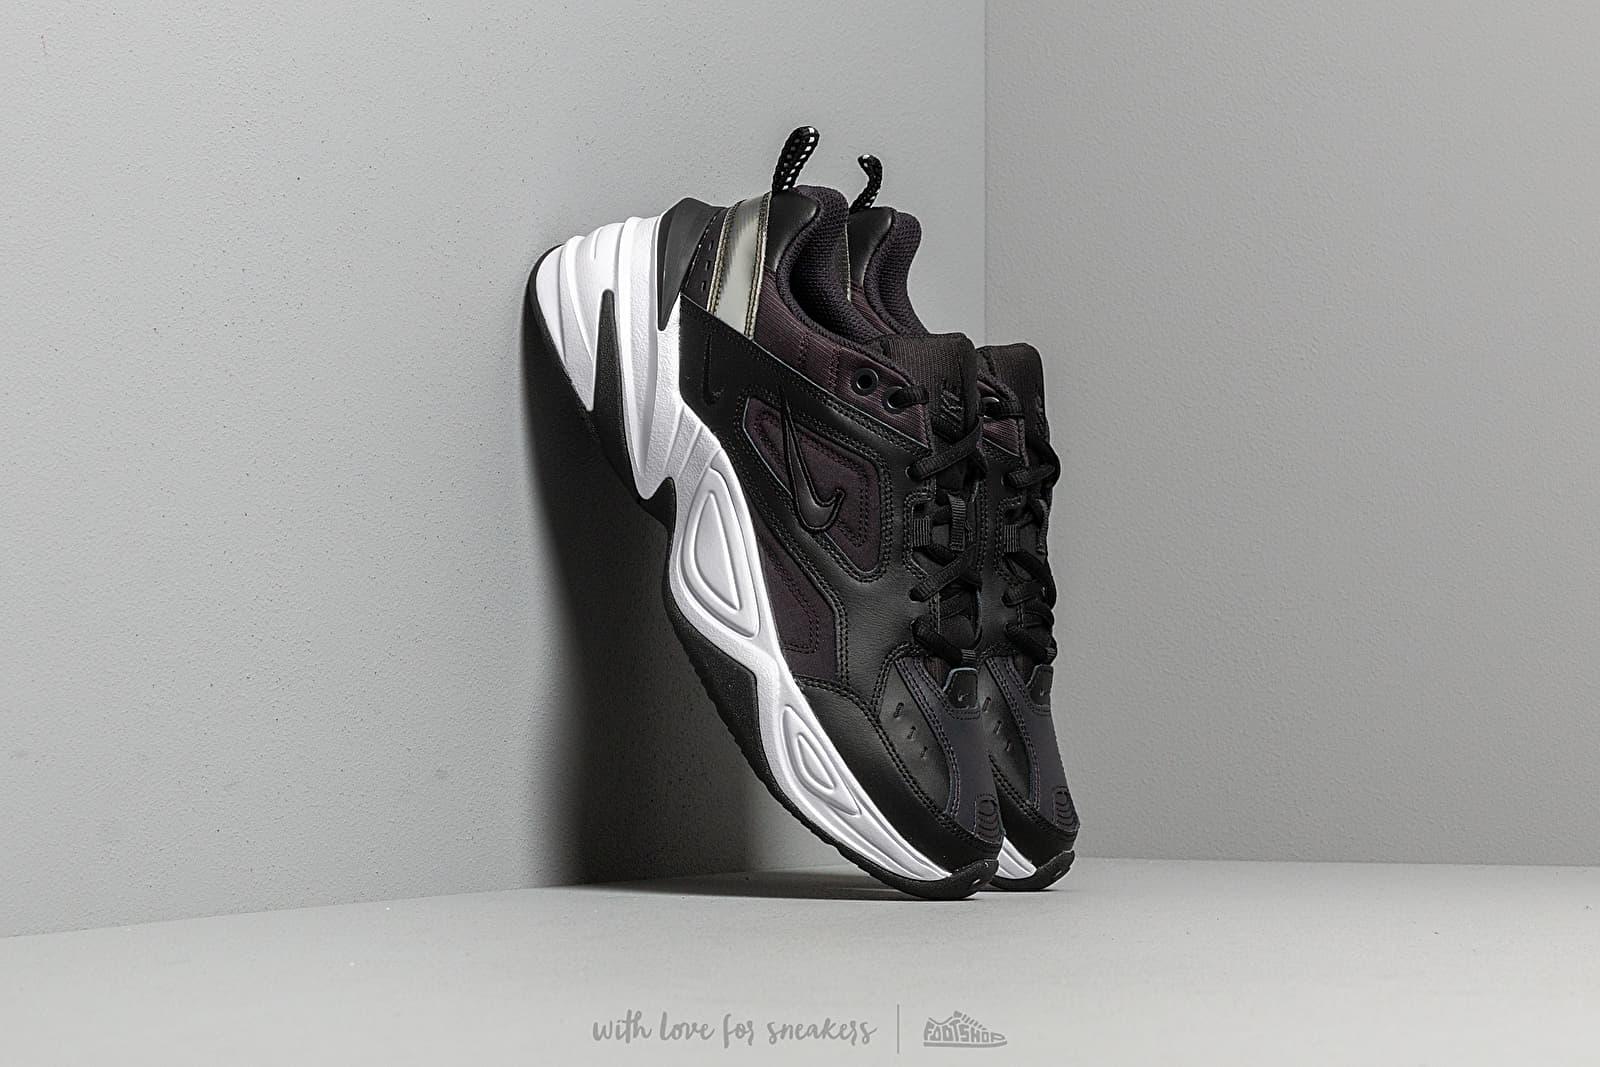 ff2741435ab Nike W M2K Tekno Black/ Oil Grey-White at a great price 95 €